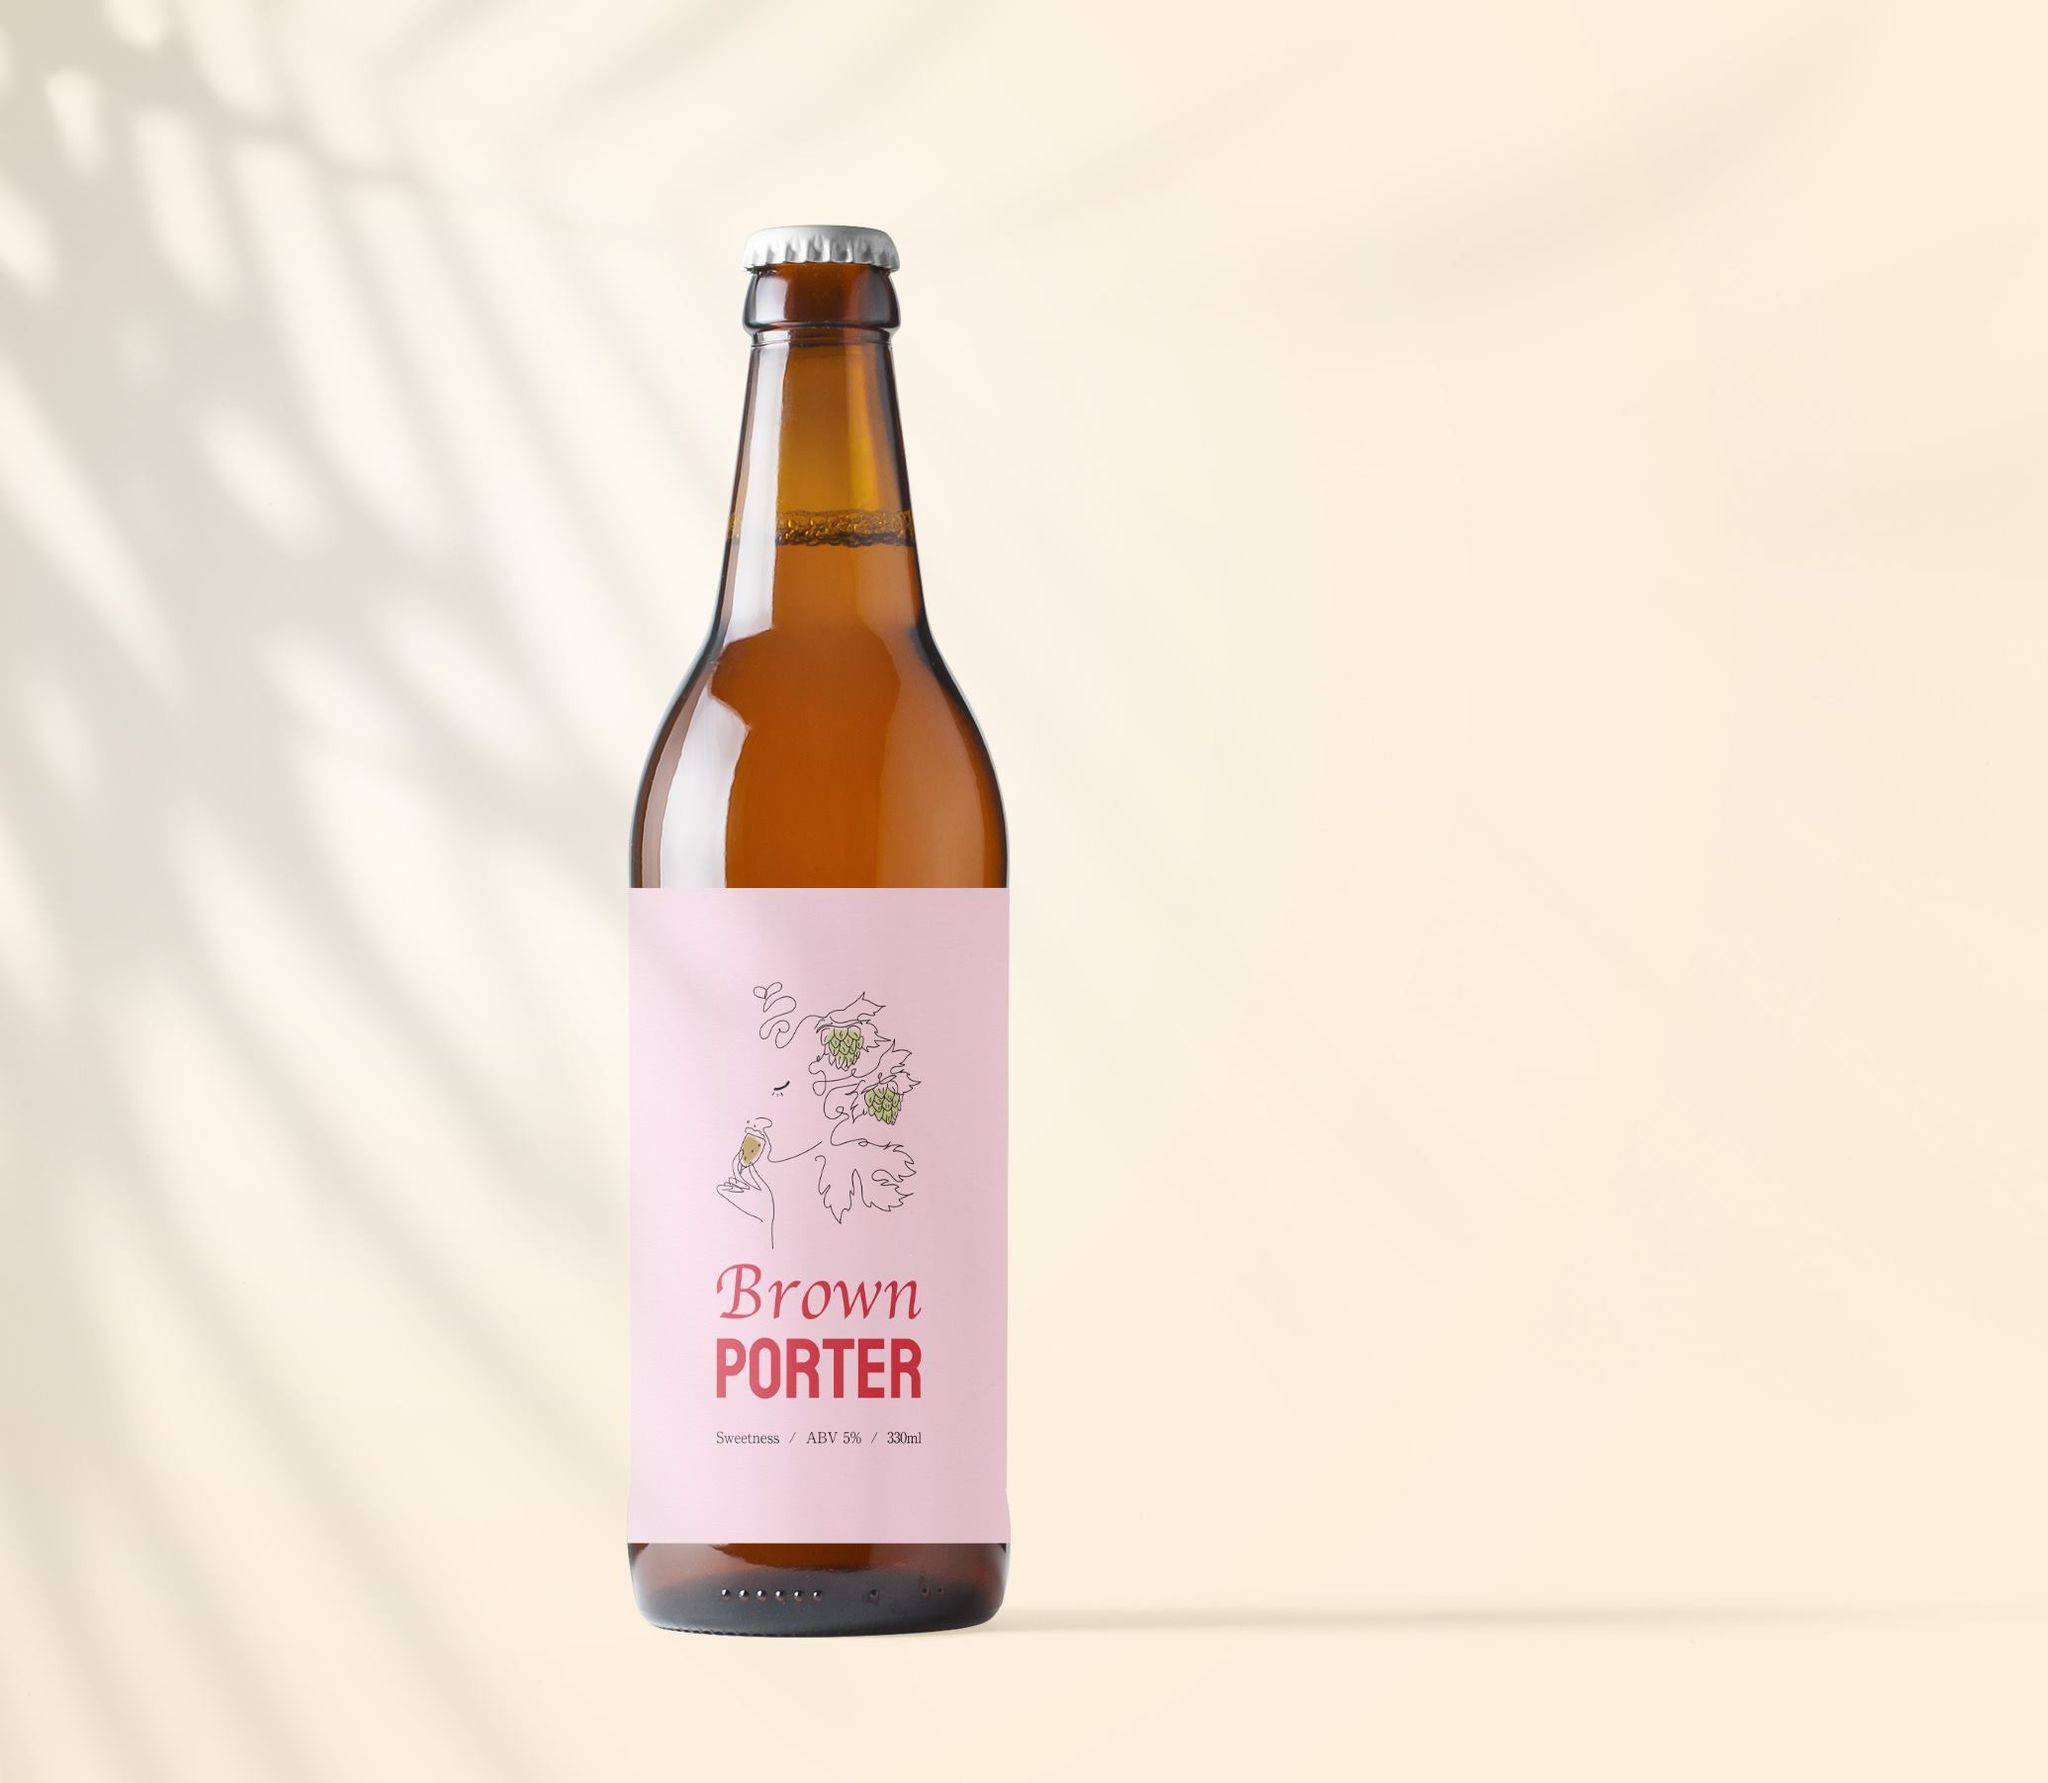 #006 Brown Porter